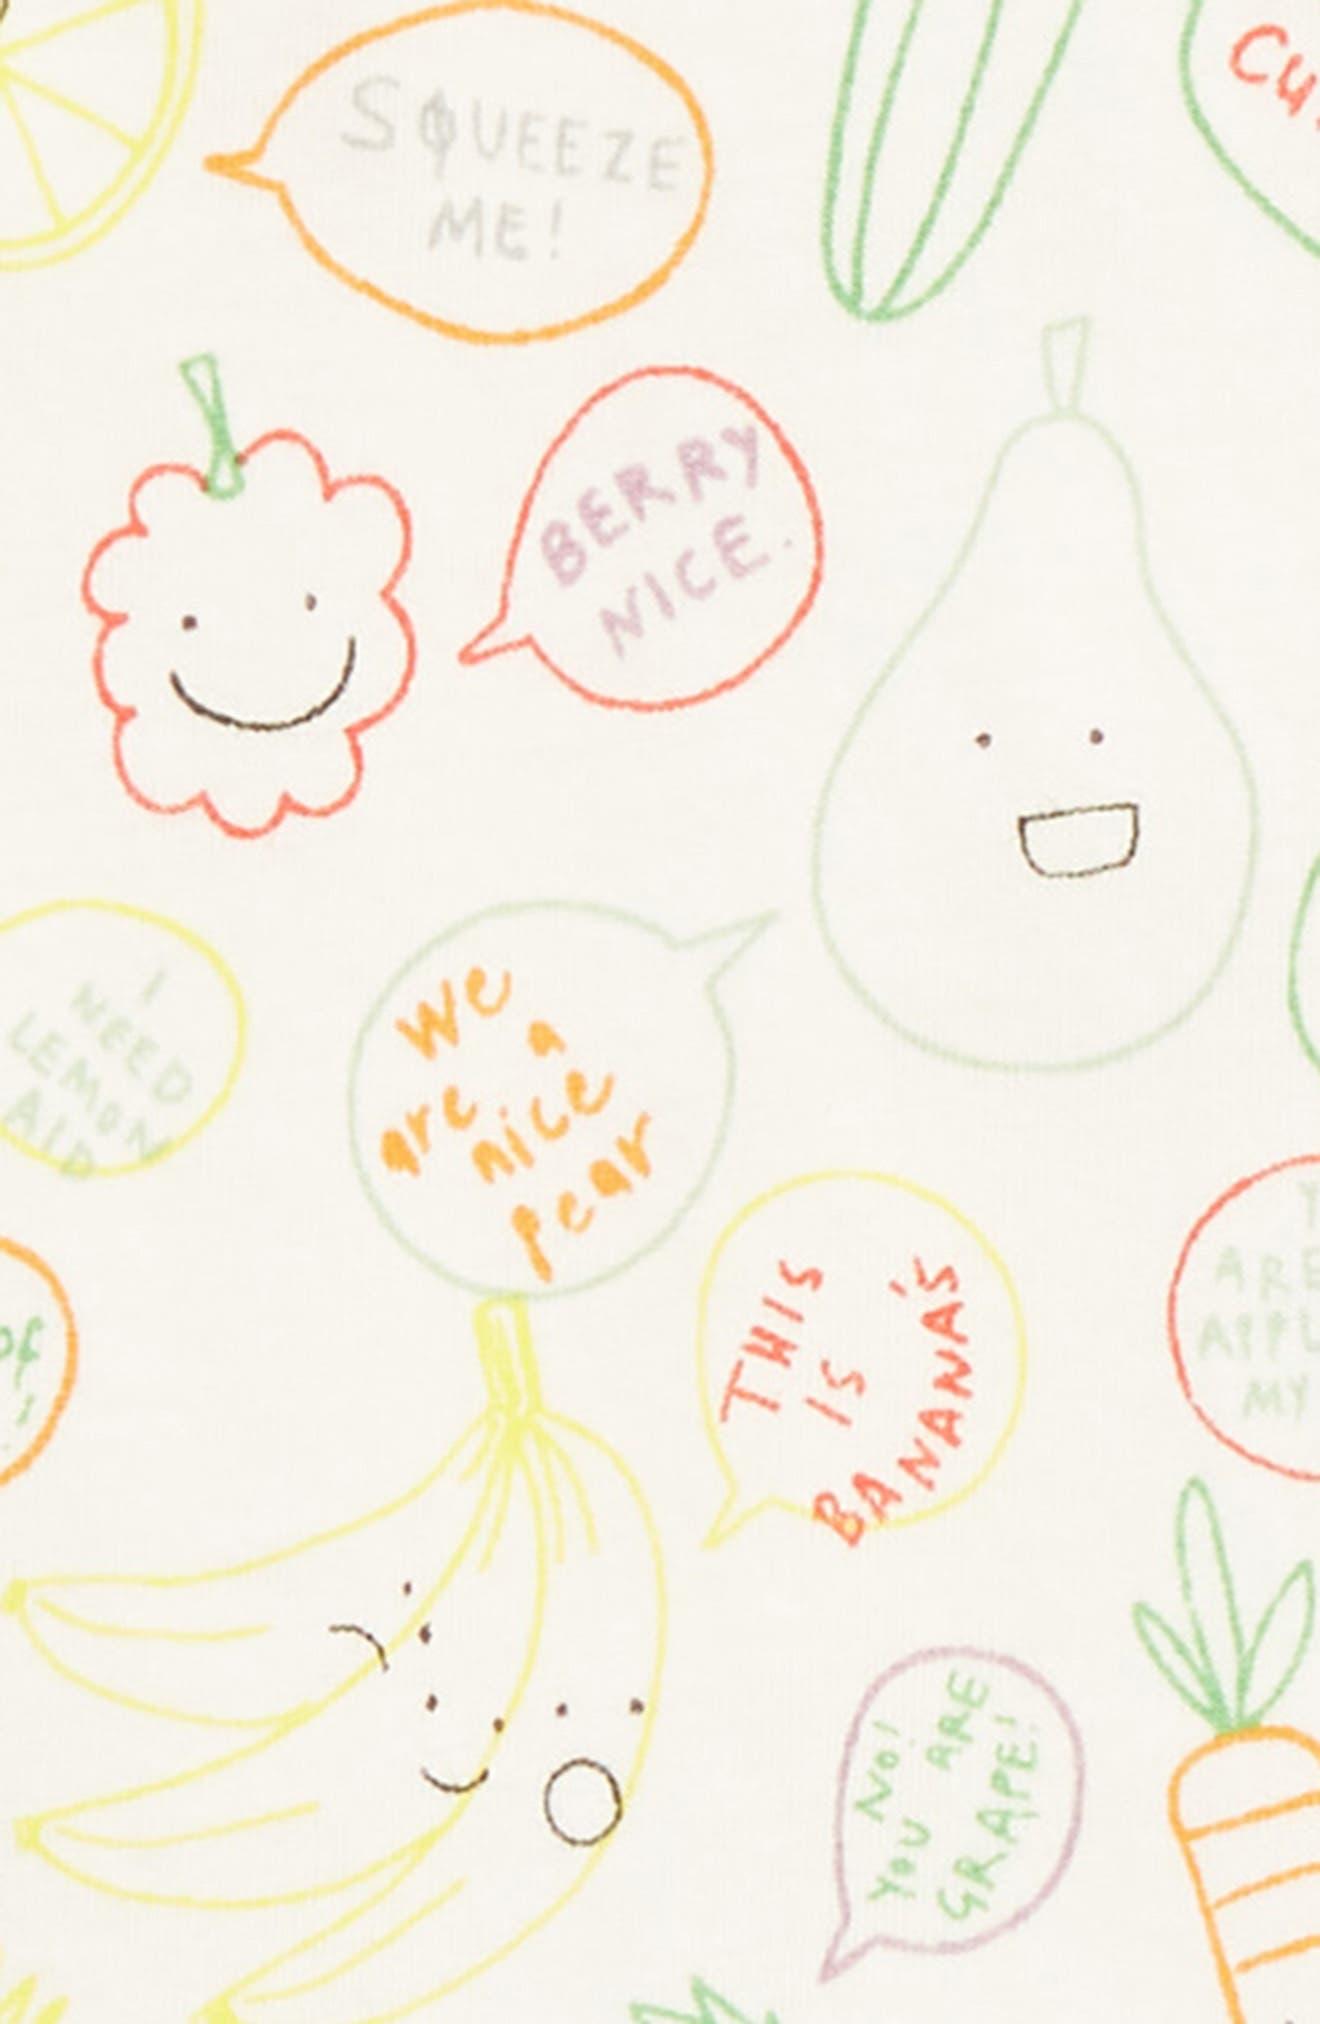 STELLA MCCARTNEY KIDS, Stella McCartney Fruit & Veggie Print Footie, Alternate thumbnail 2, color, 9092 MULTI